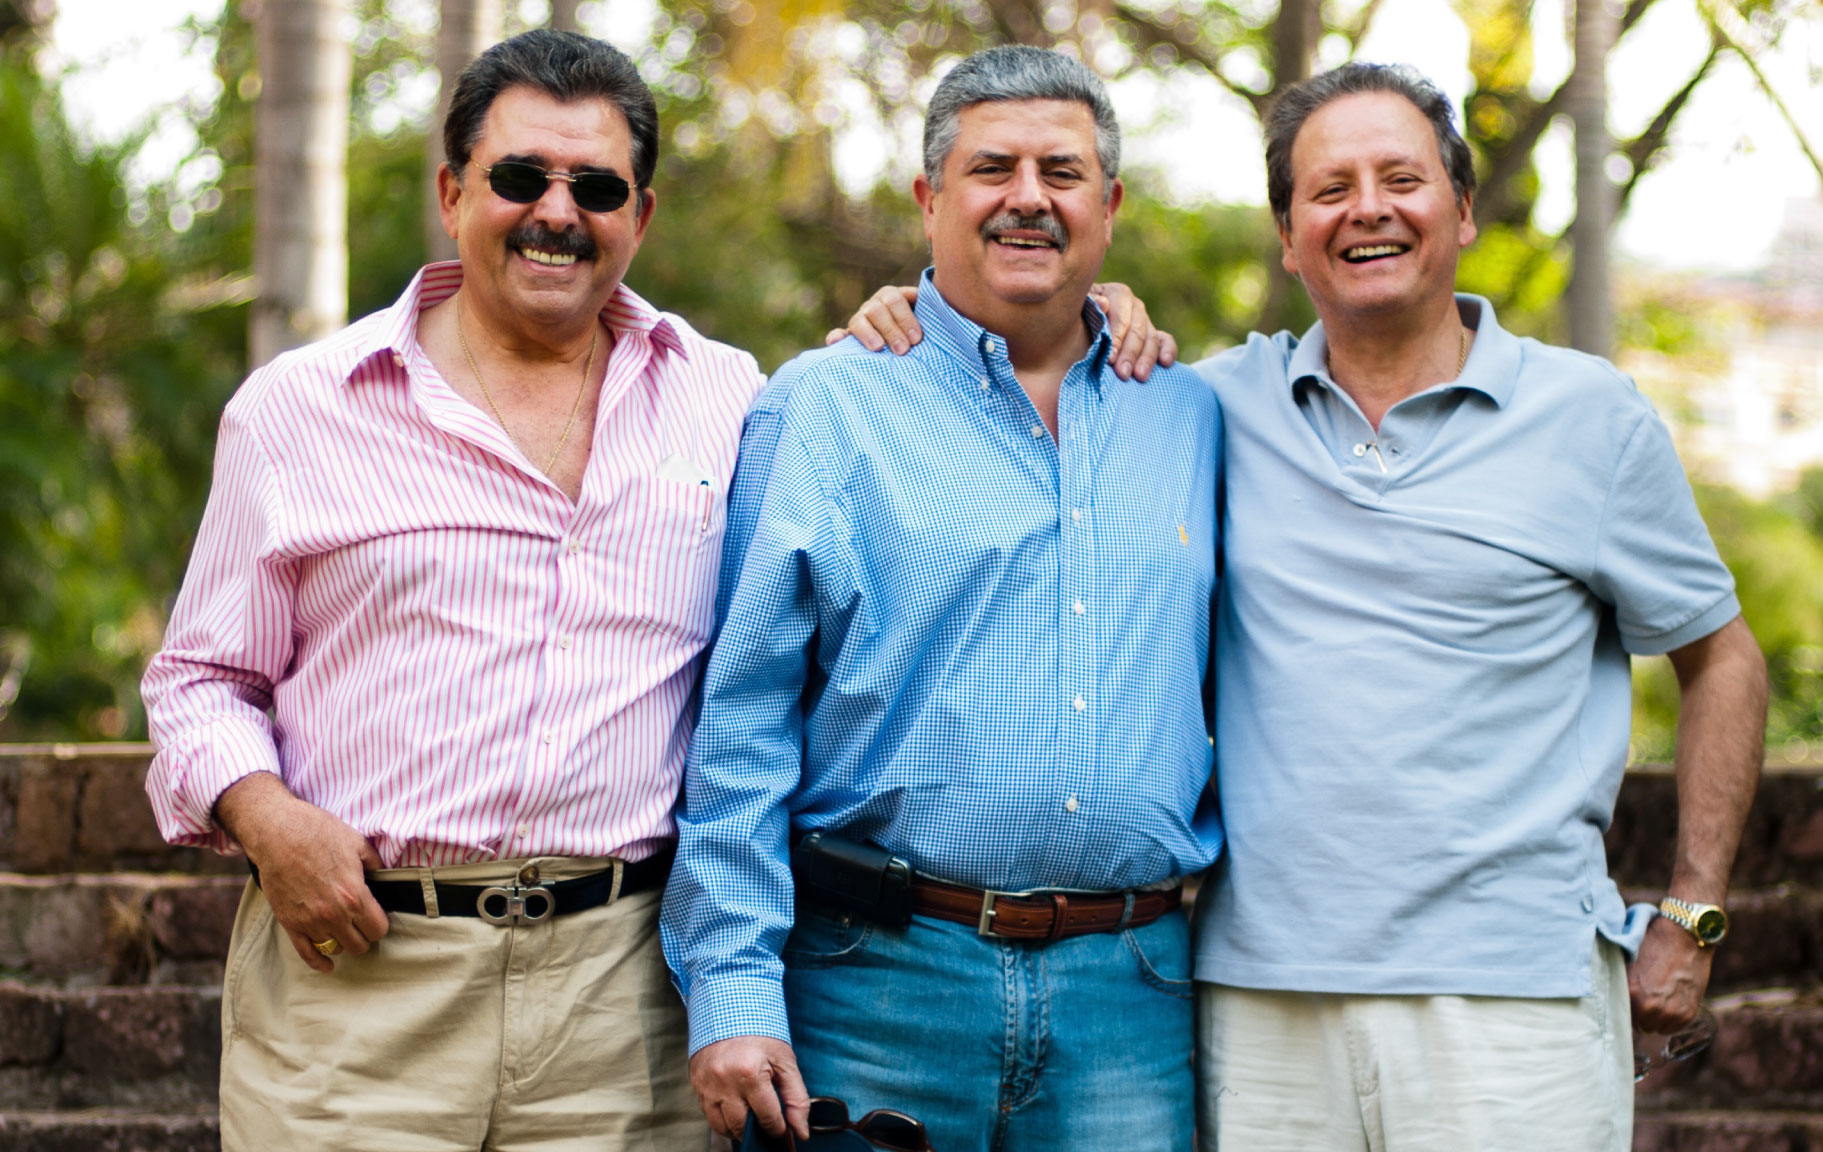 Los Hermanos Kafie, Schucry Kafie, Eduardo Kafie y Luis Kafie